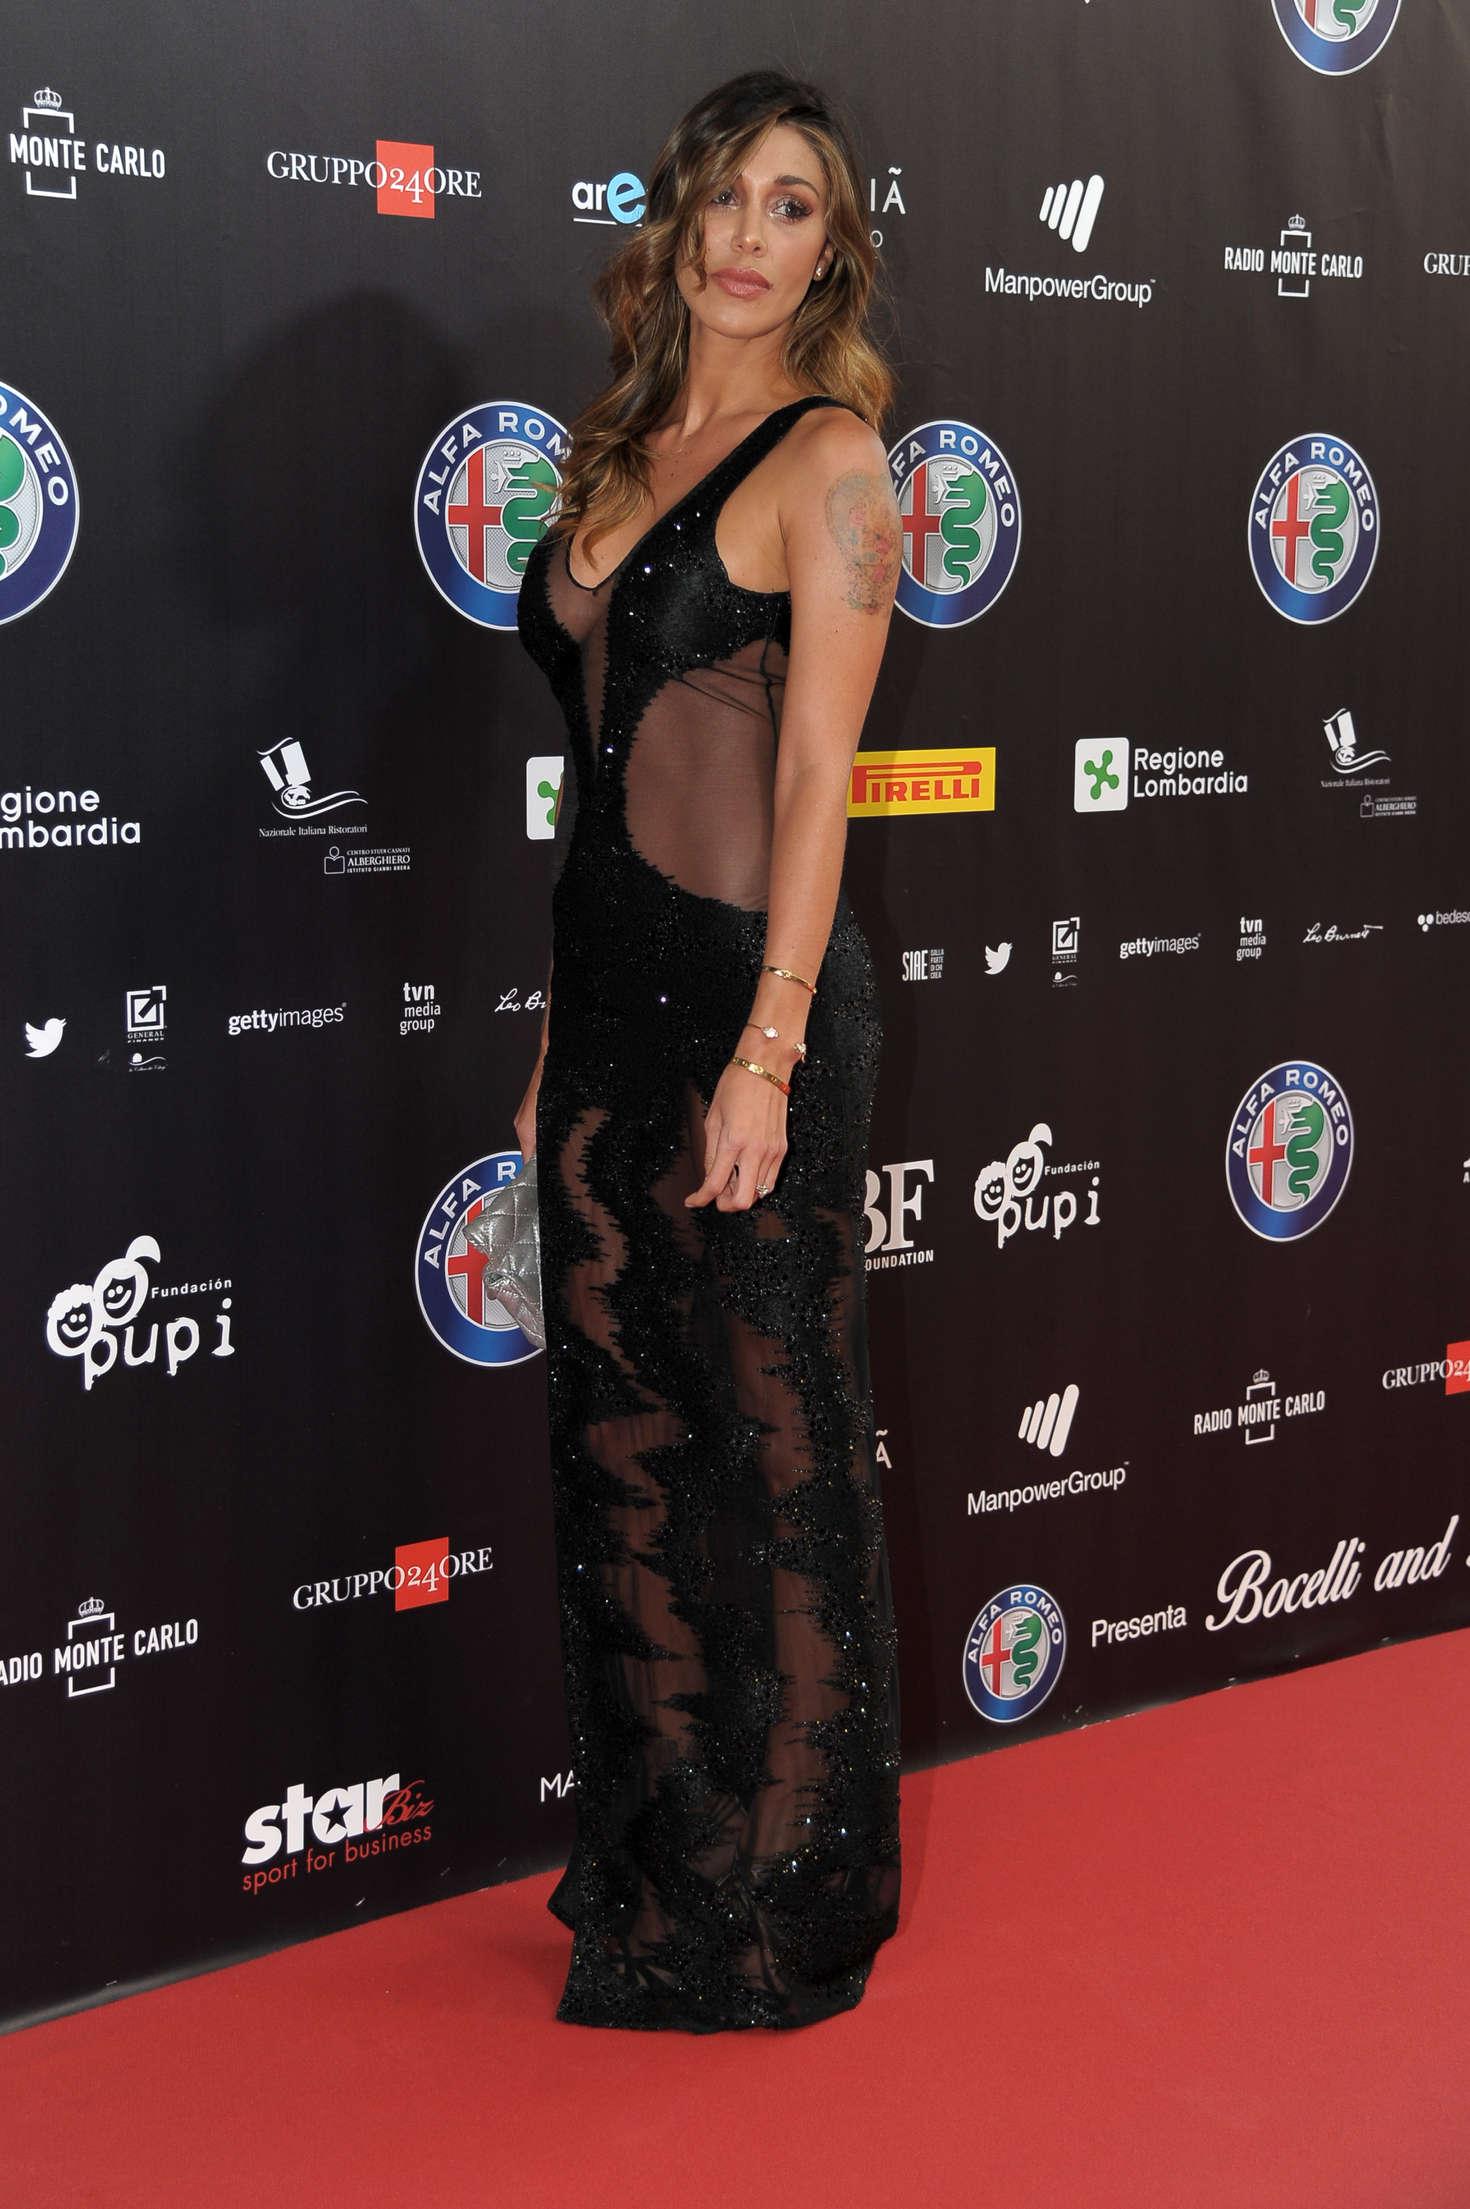 Belen Rodriguez 2016 : Belen Rodriguez: Bocelli and Zanetti Night -06